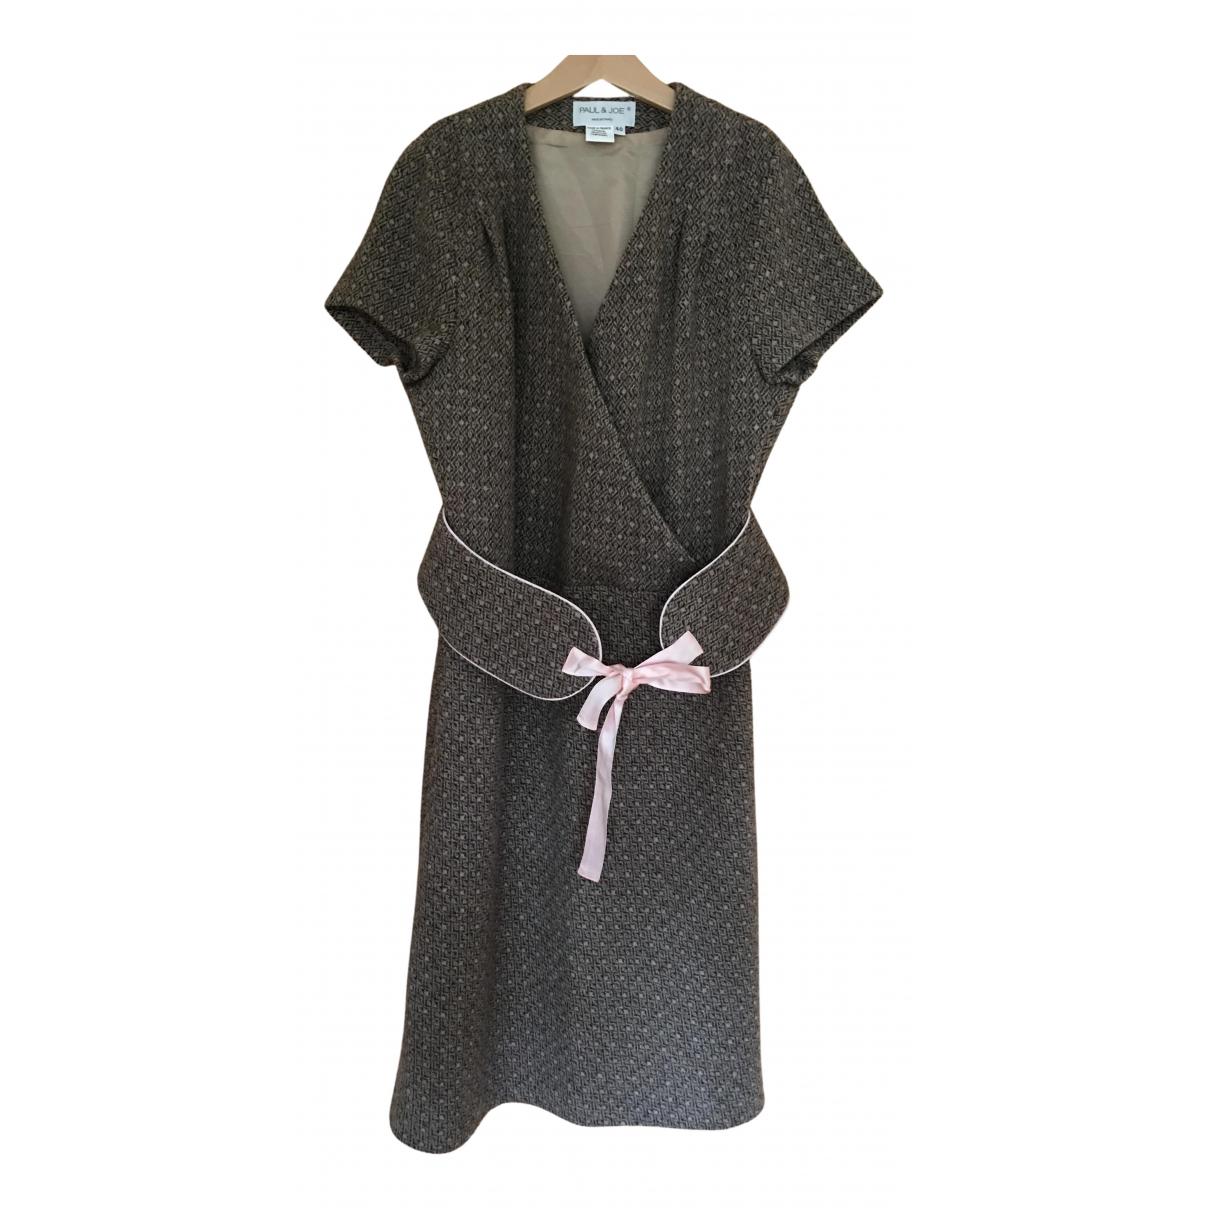 Paul & Joe - Robe   pour femme en laine - beige